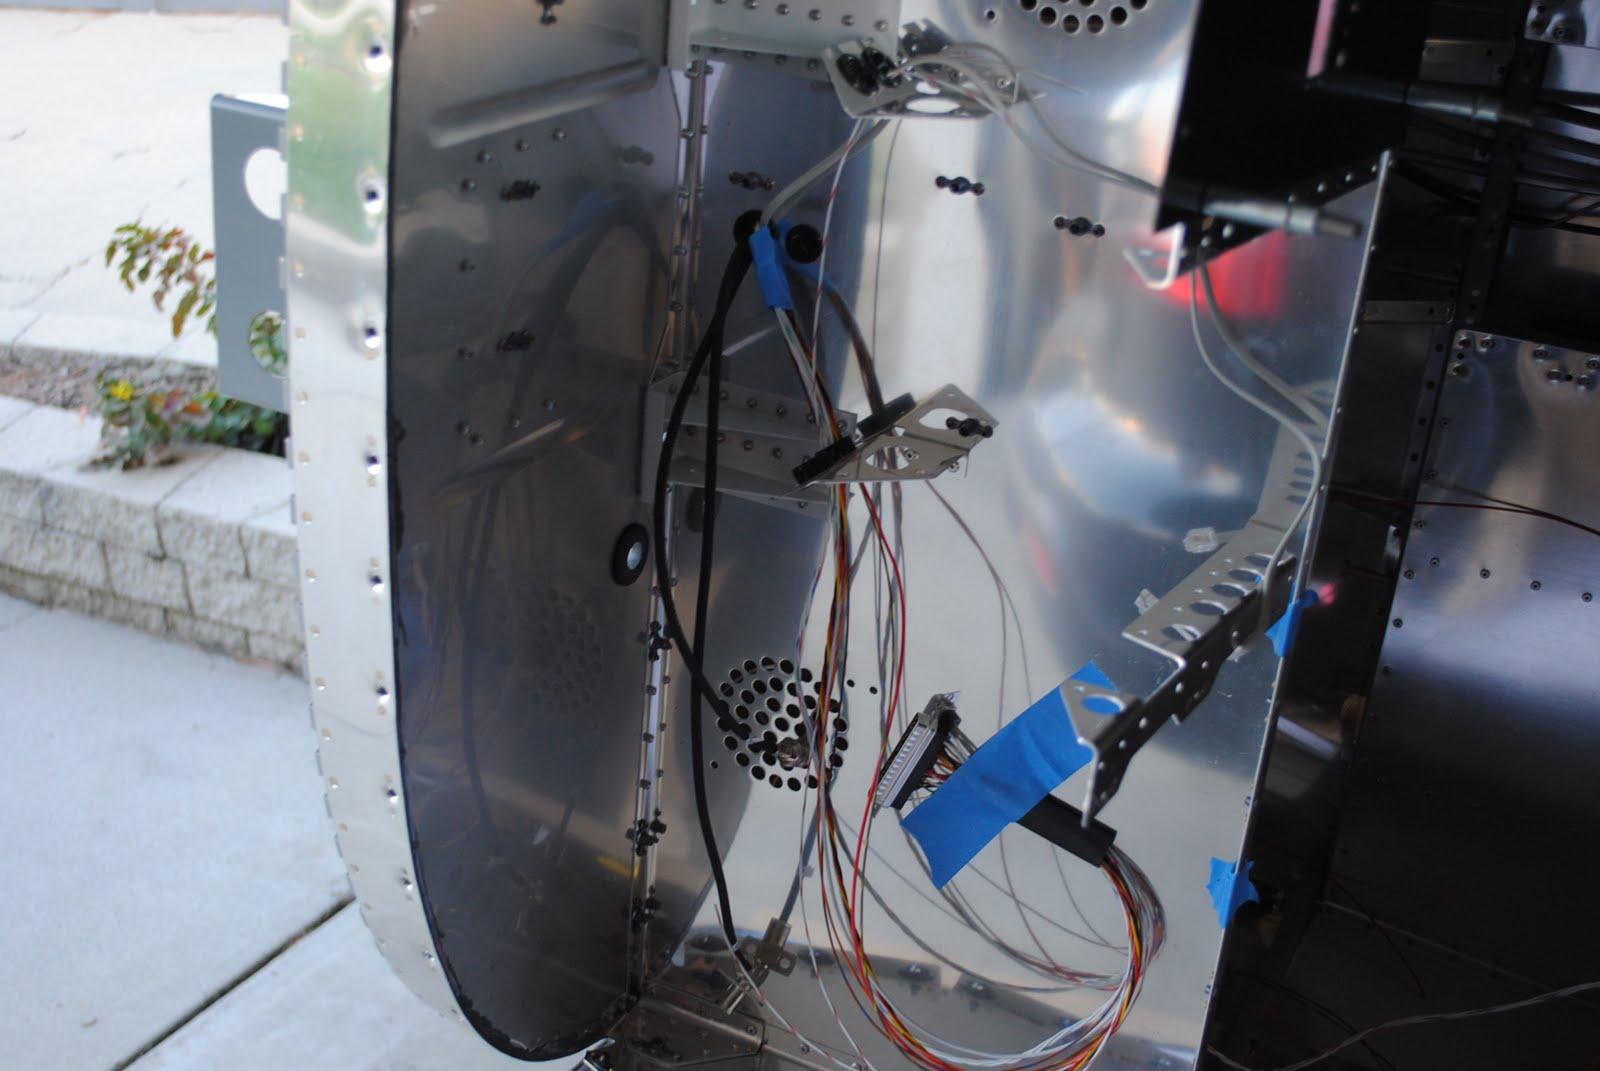 Wiring Harness Builder : Rv builder in sandy ut started wiring harness